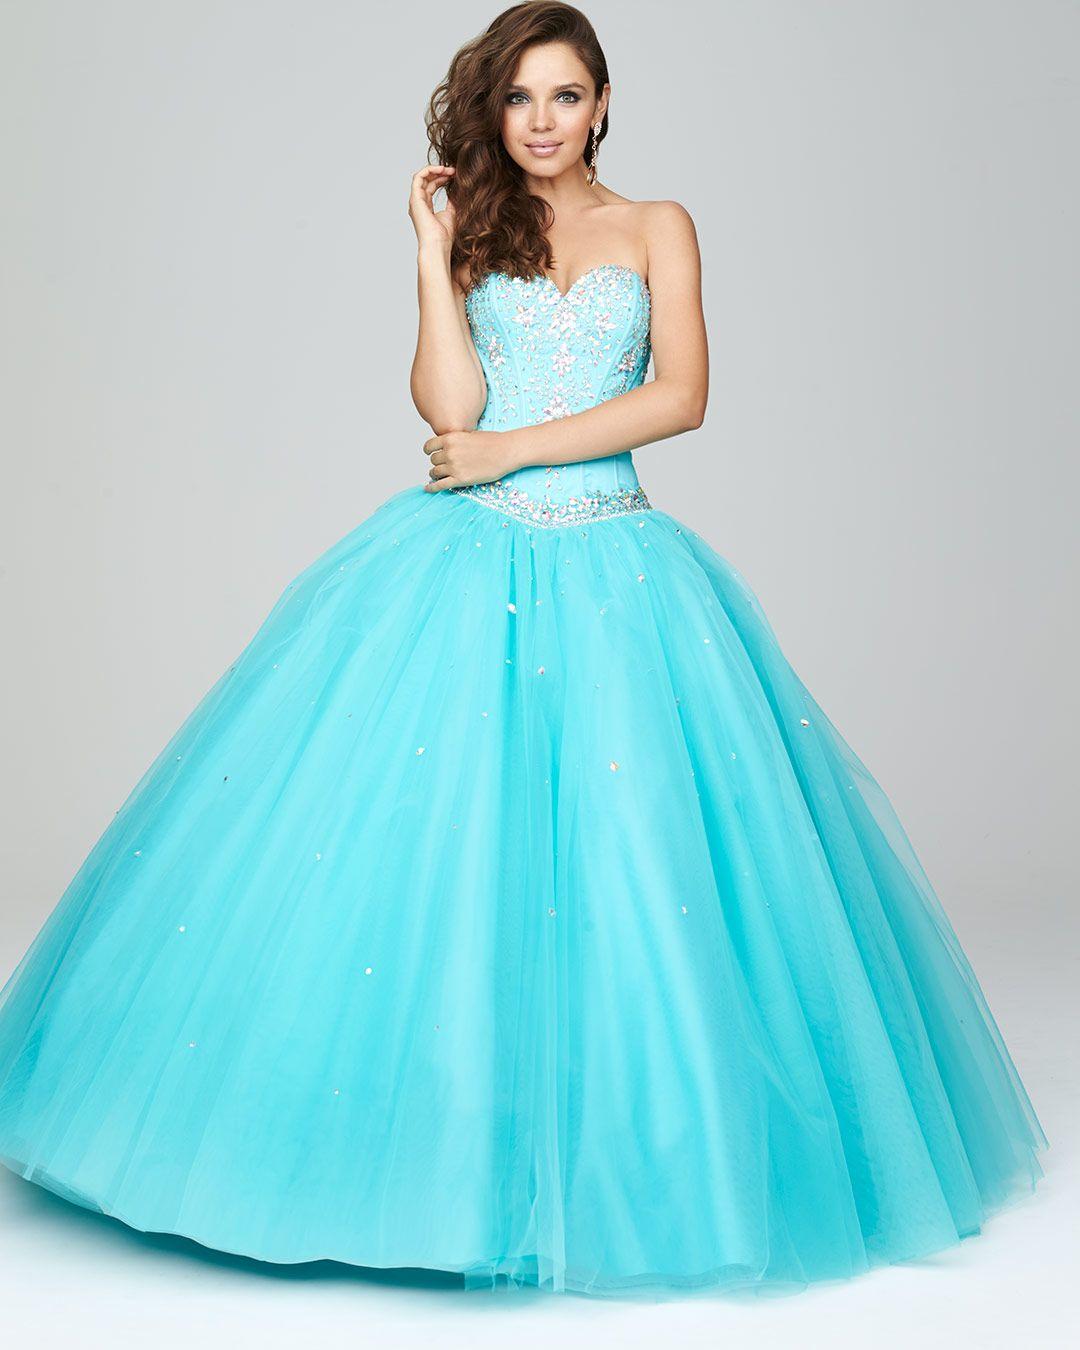 Allure Bridals: Style: Q464 | QUINCEANERA | Pinterest | Formal ...